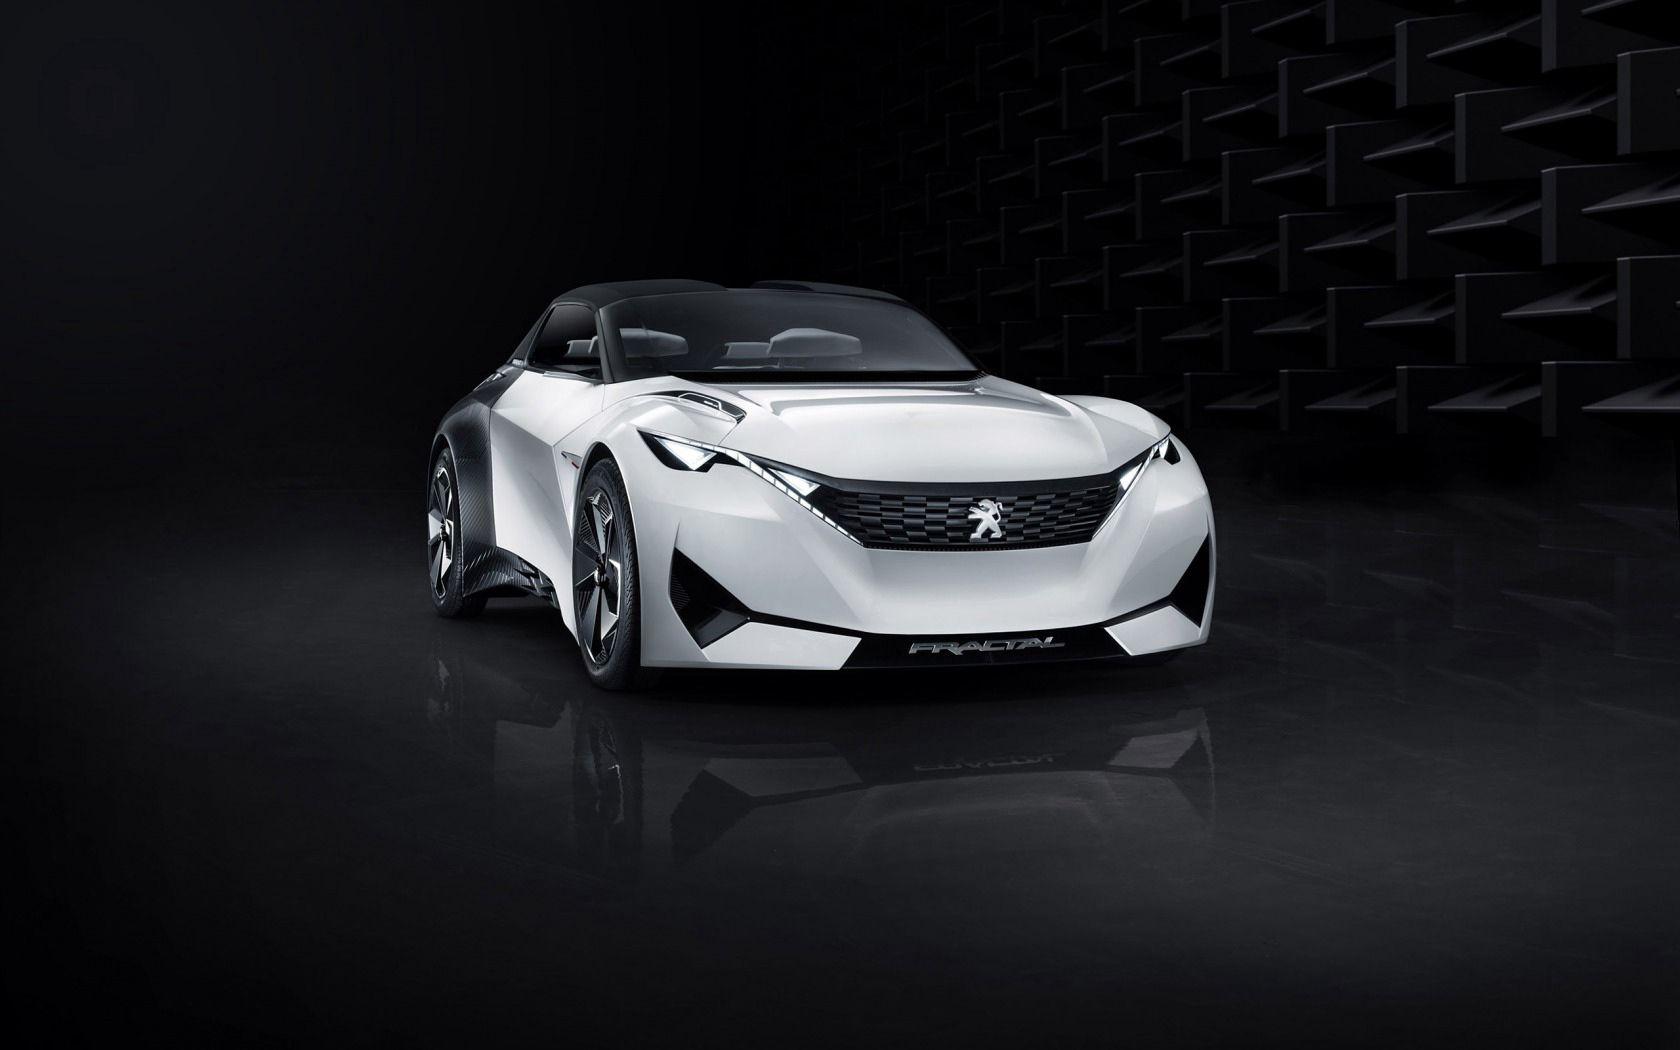 57341 скачать обои Пежо (Peugeot), Тачки (Cars), Вид Спереди, Концепт, Fractal - заставки и картинки бесплатно